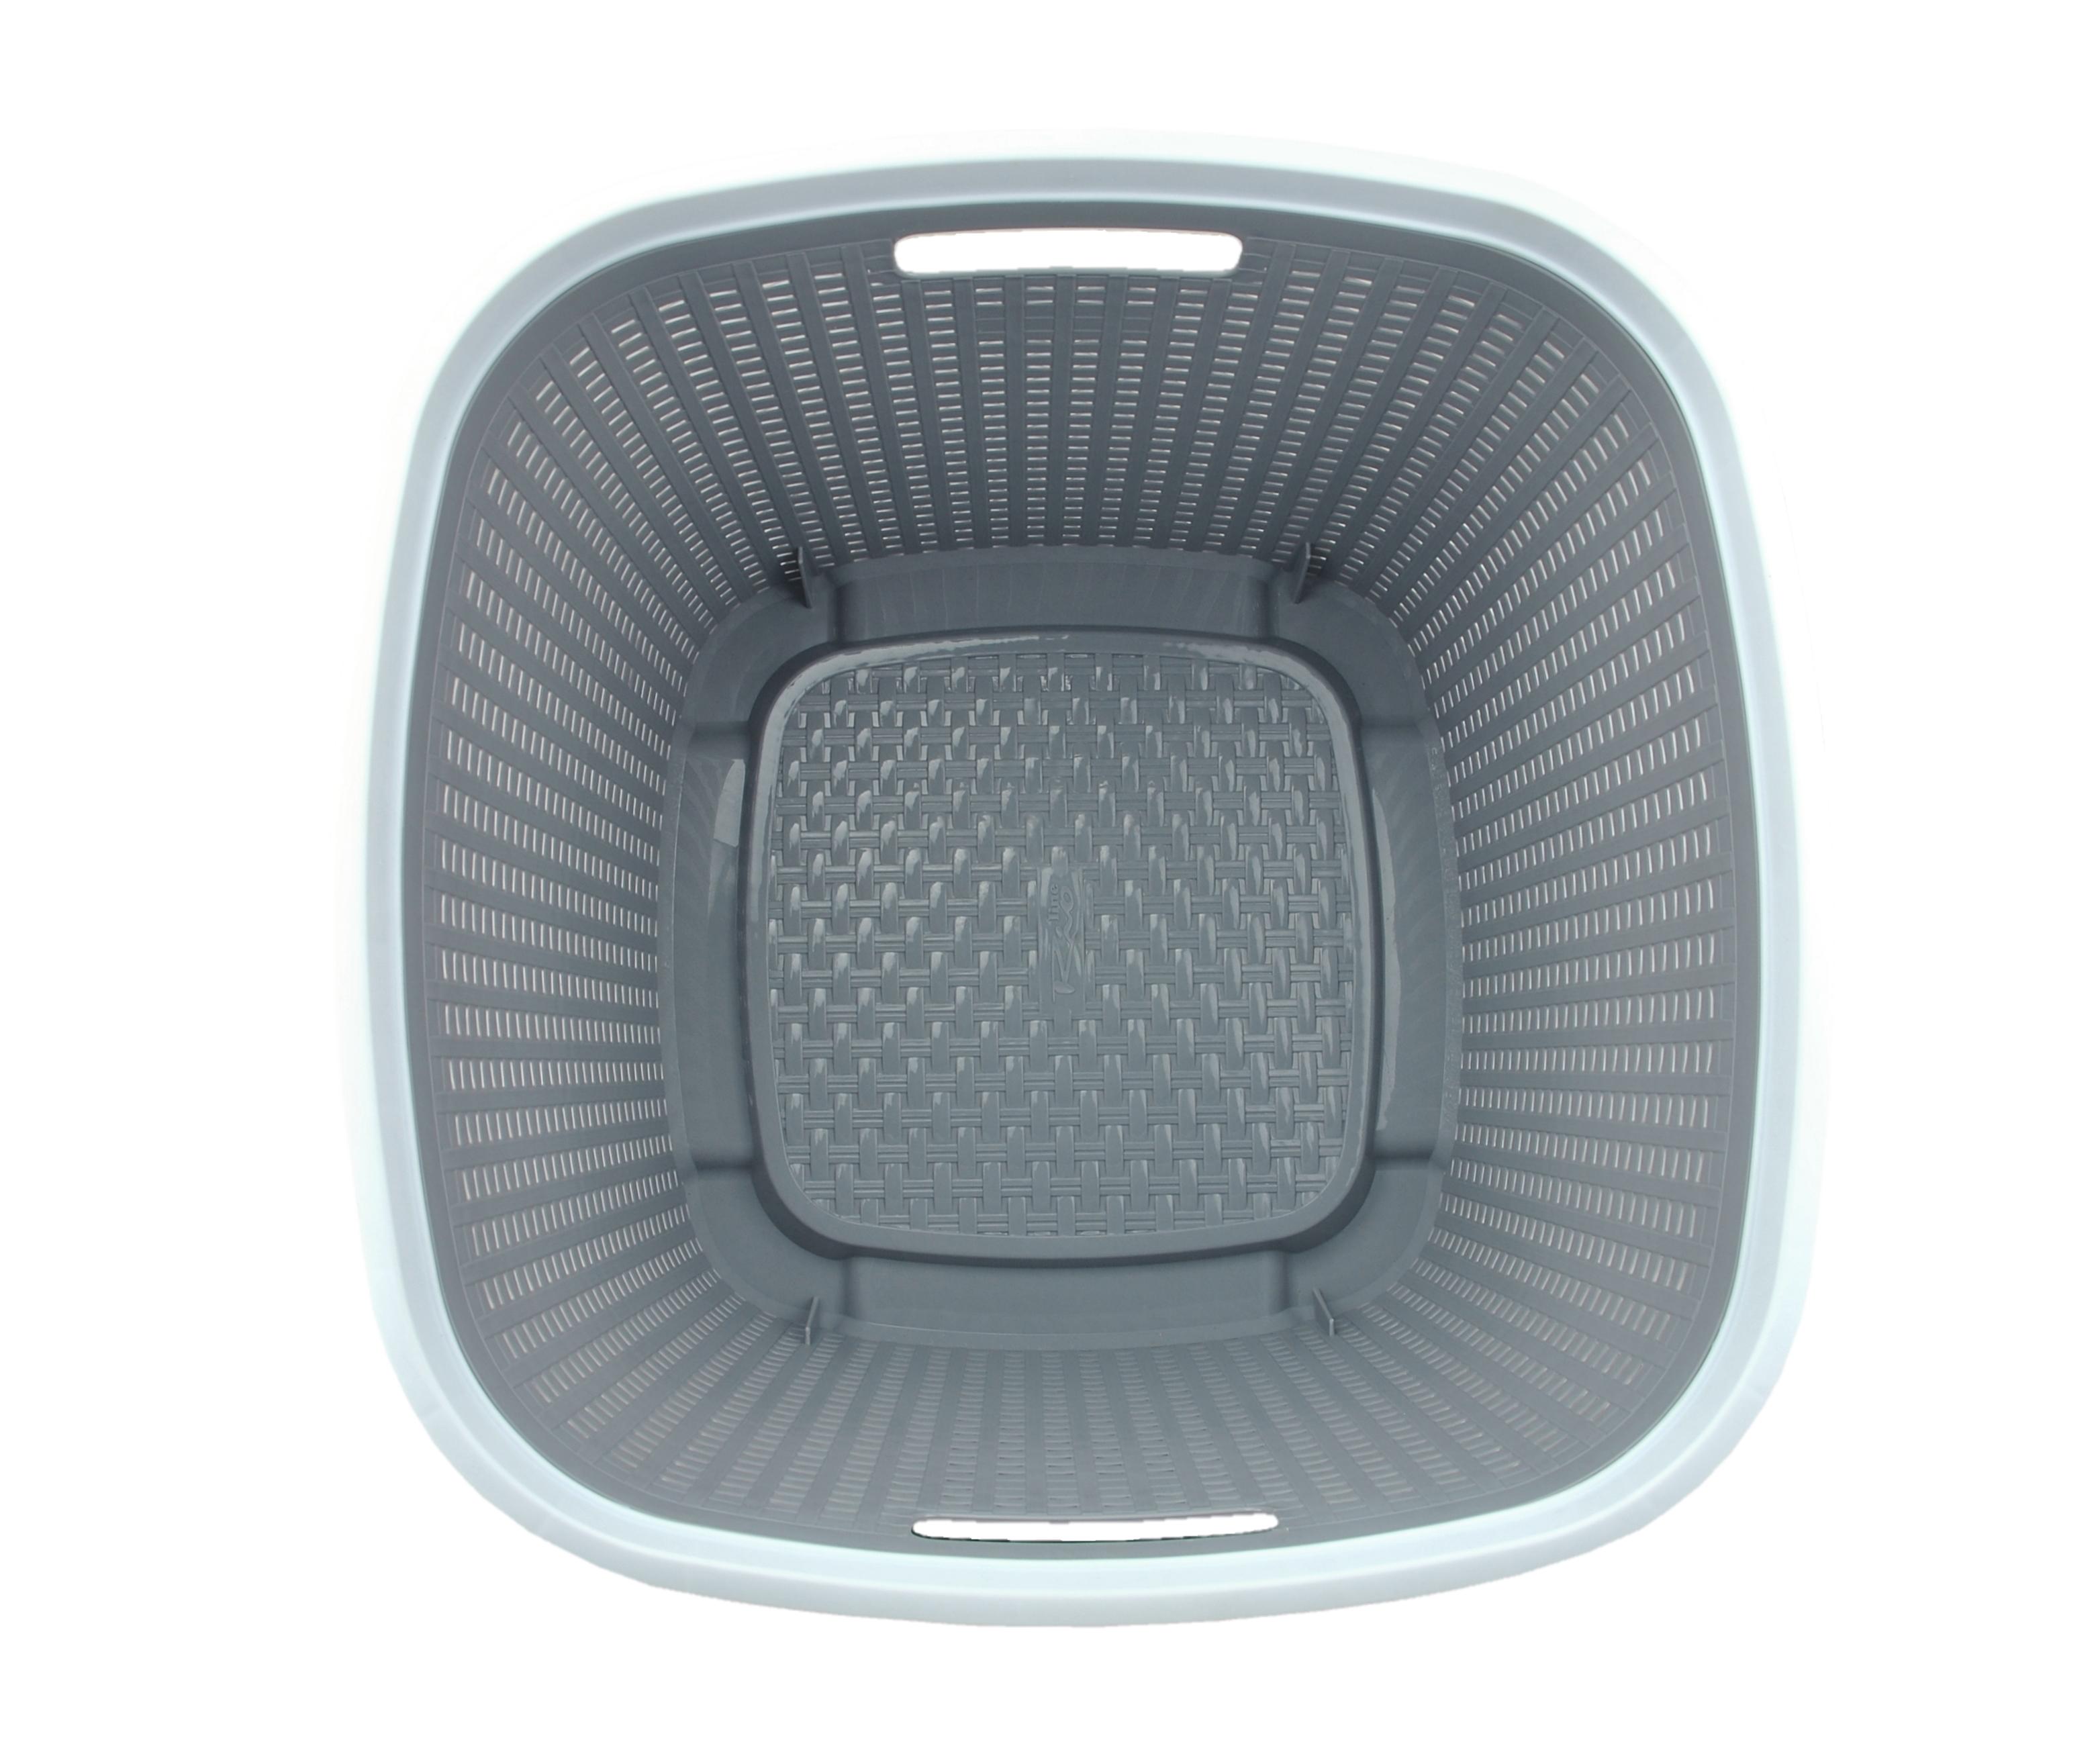 w schekorb rio grau wei kunststoff 43 5x43 5x33 5cm. Black Bedroom Furniture Sets. Home Design Ideas